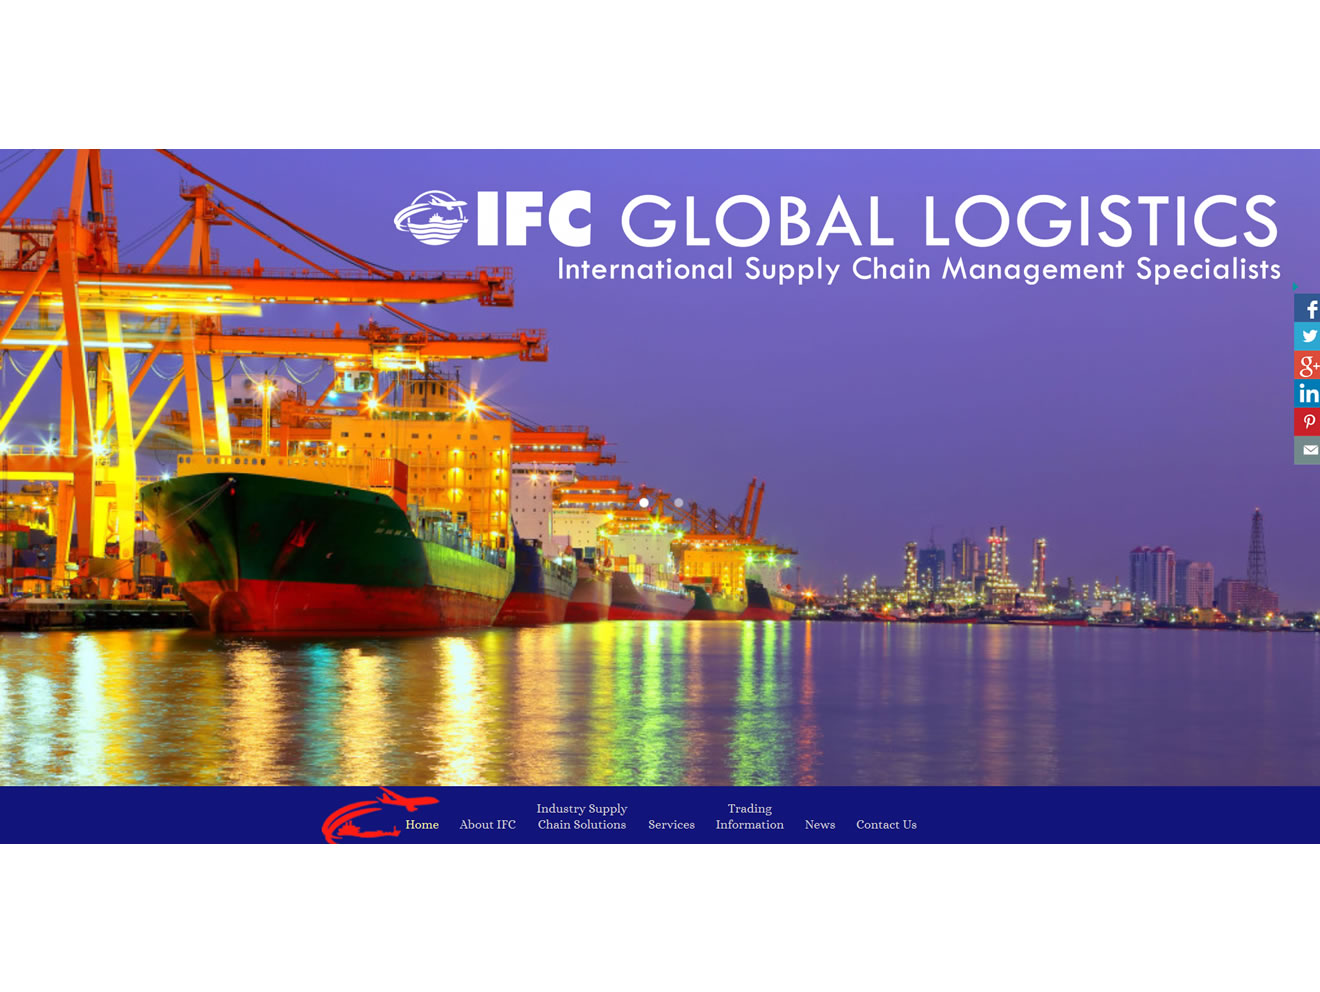 ifcgloballogistics